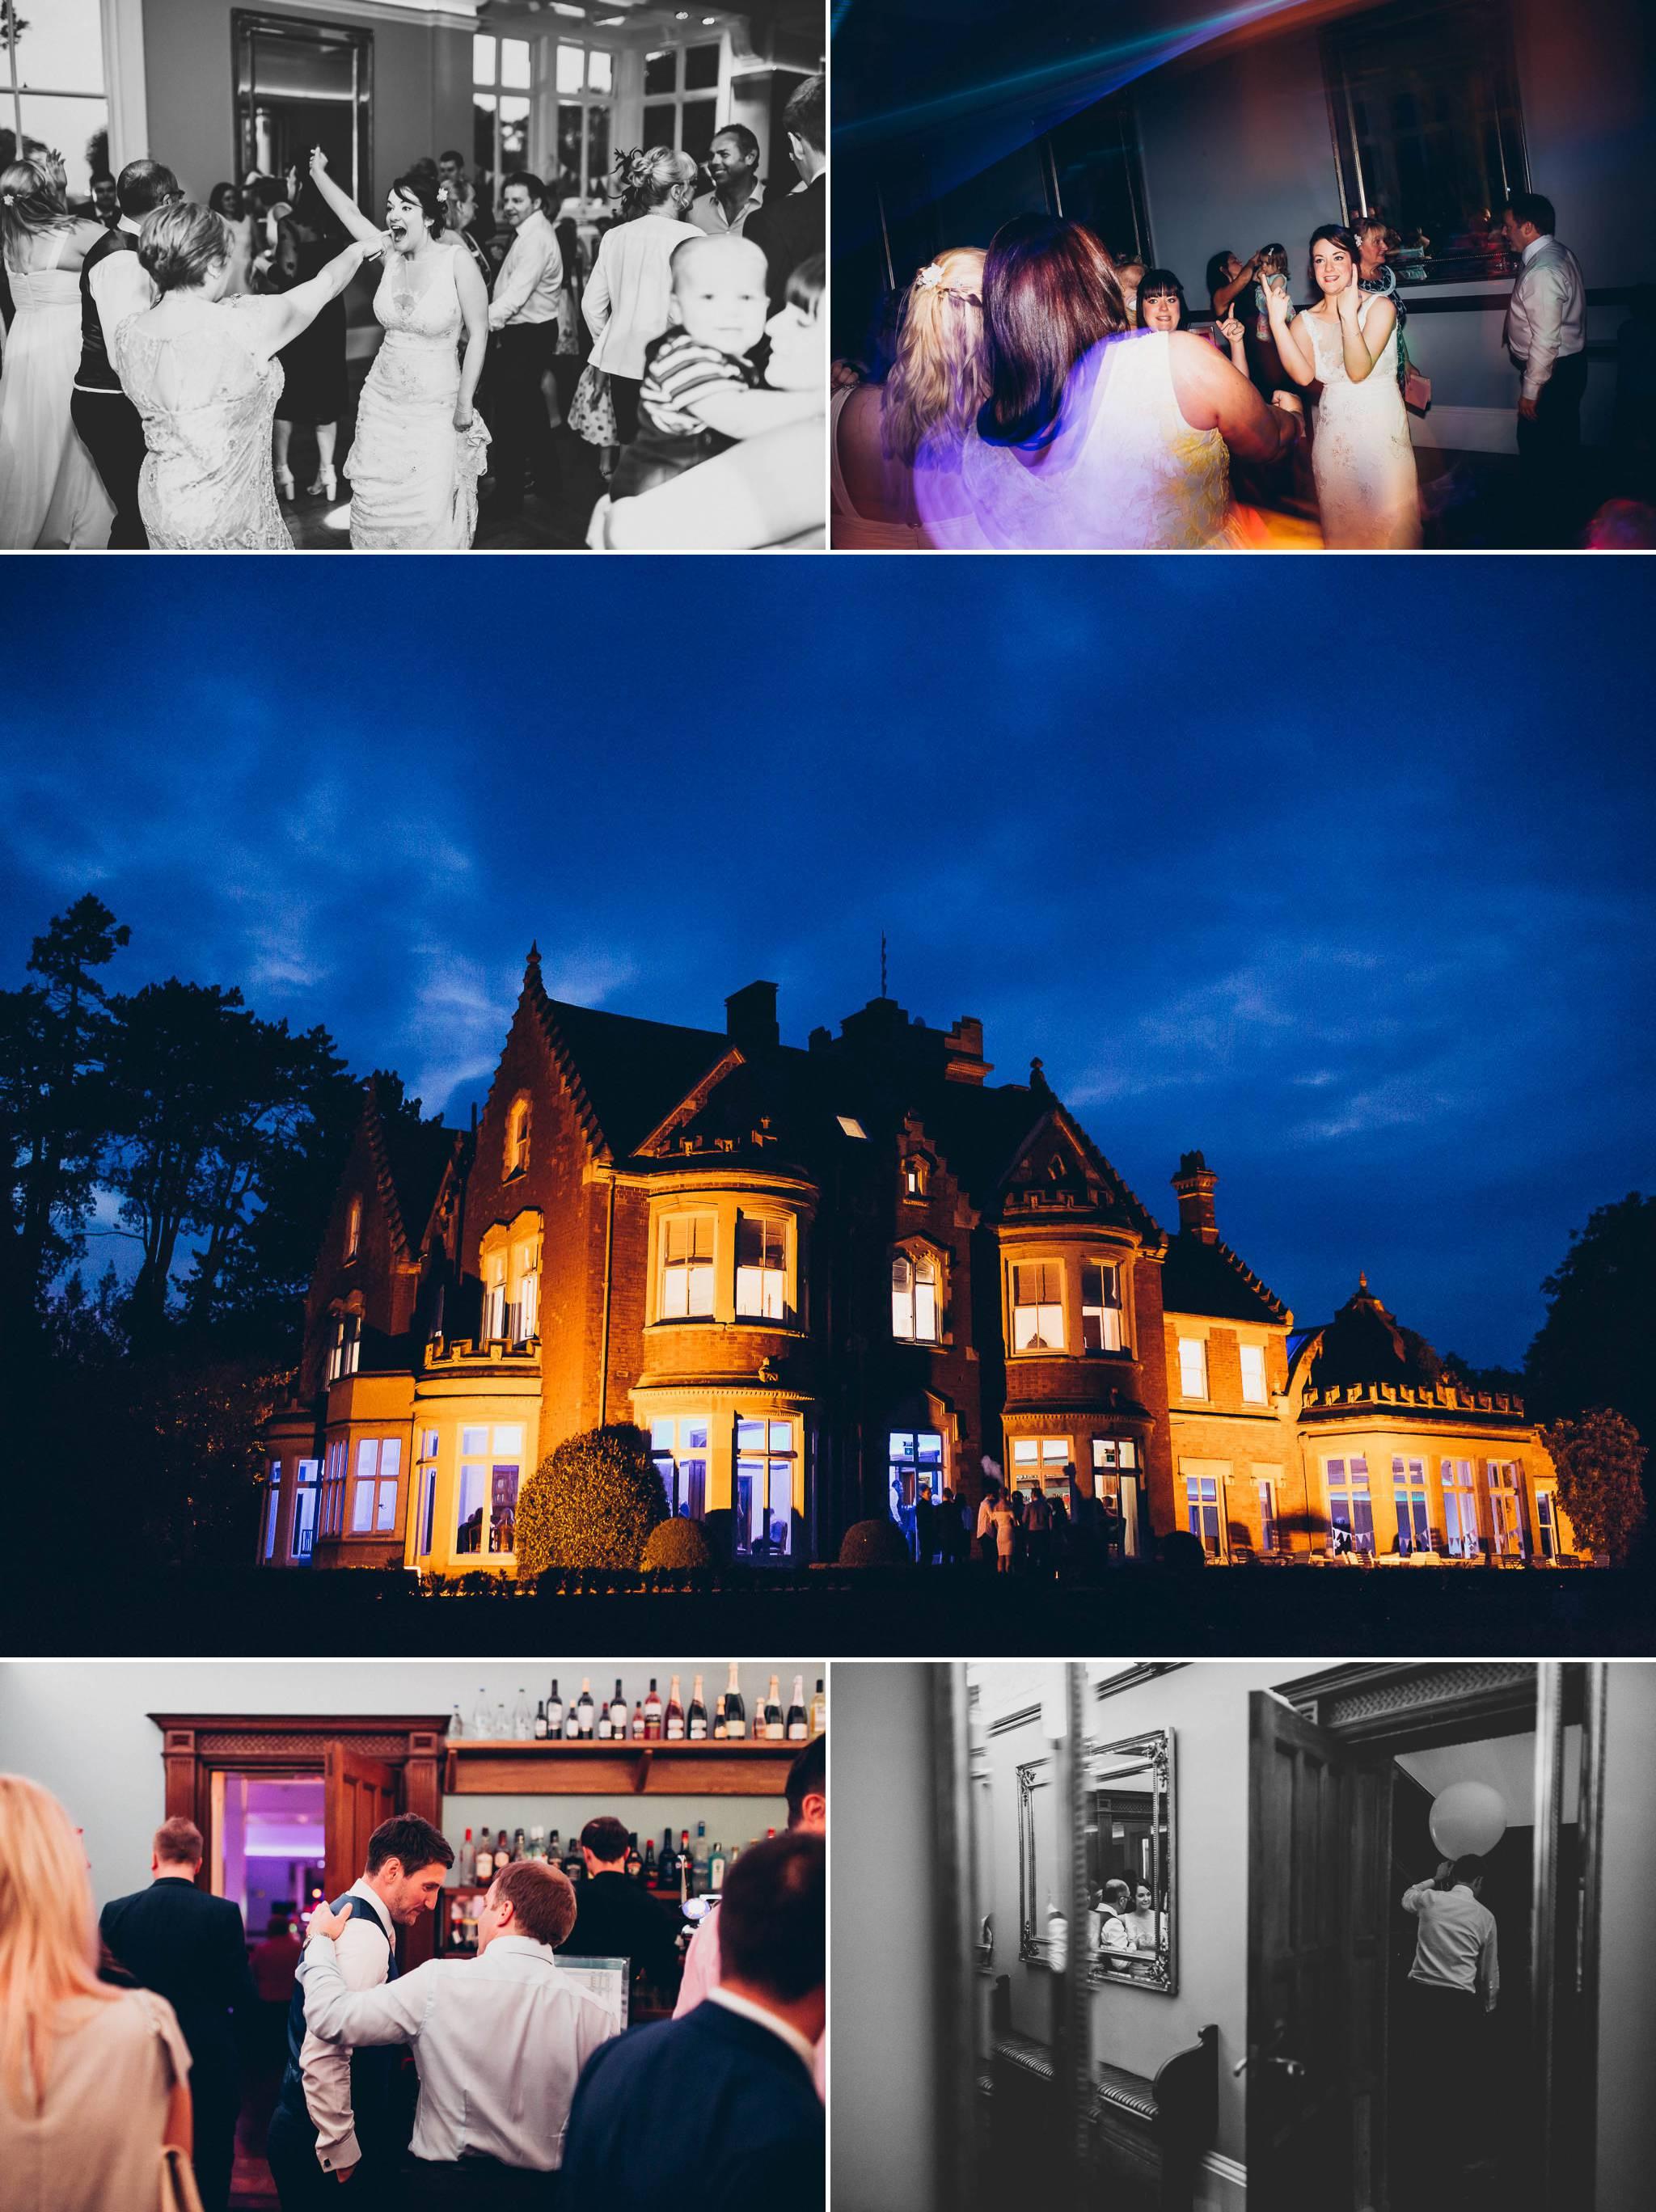 pendrell-hall-wedding-photography 24.jpg